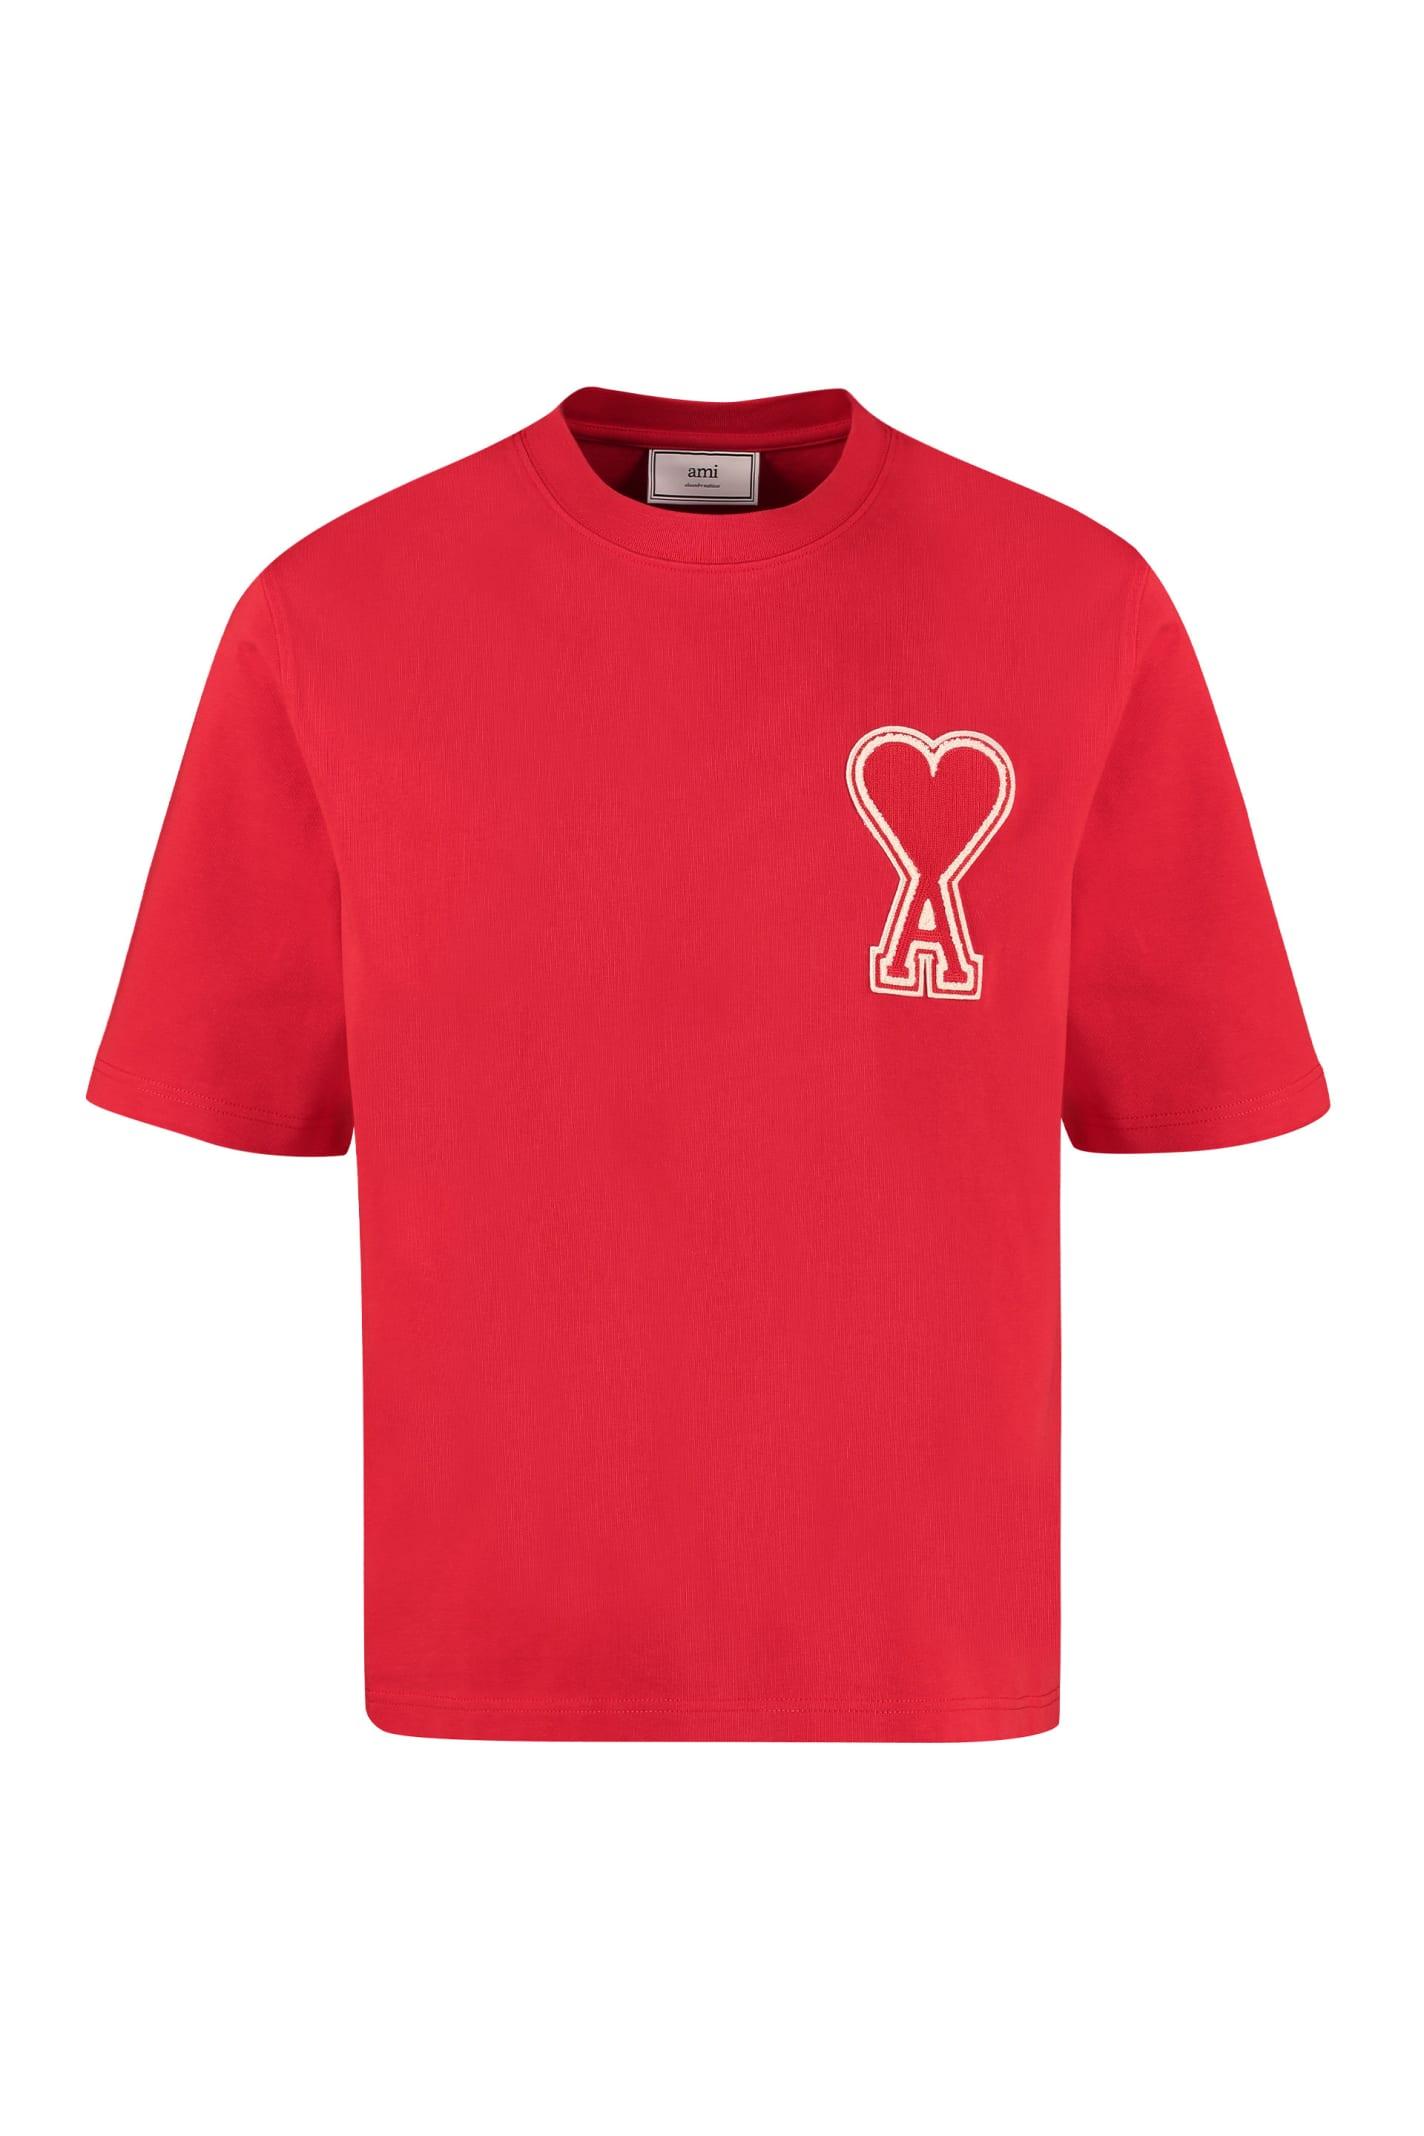 Ami Alexandre Mattiussi Cotton Crew-neck T-shirt